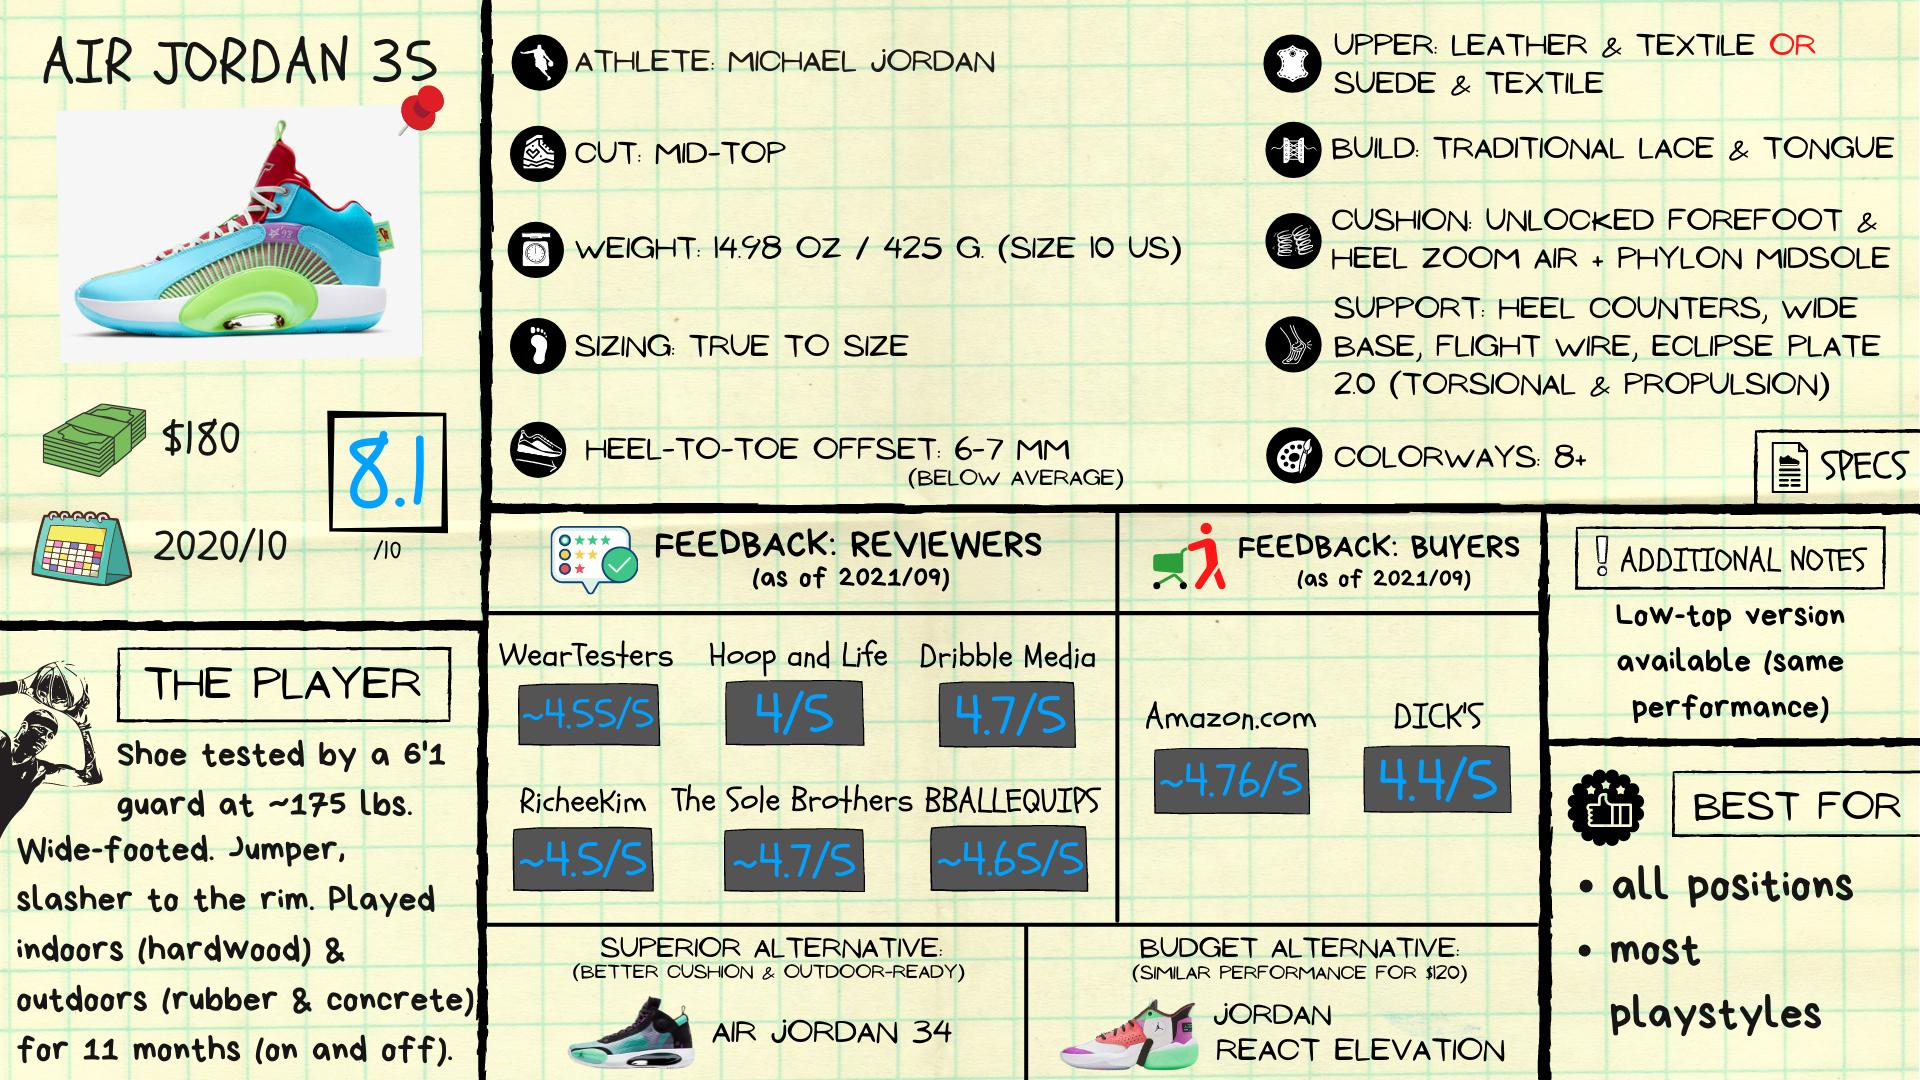 Air Jordan 35 Review: Spec Sheet